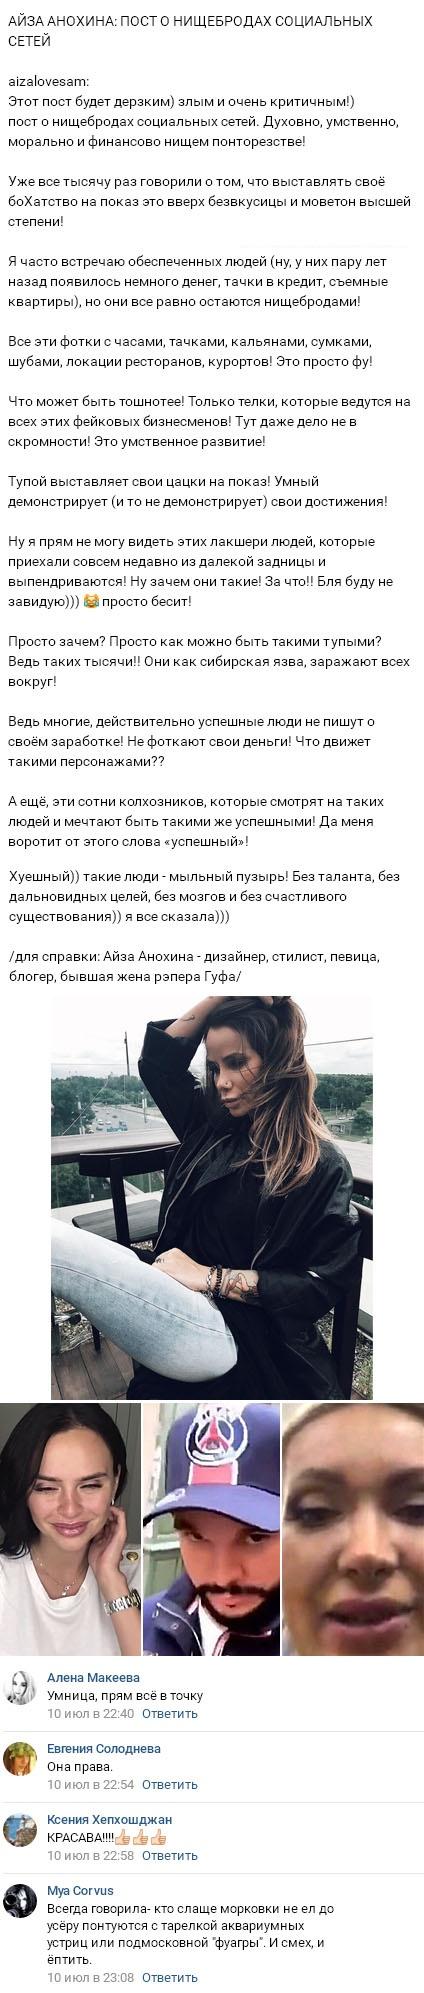 Айза Анохина поставила на место Феофилактову и Романец